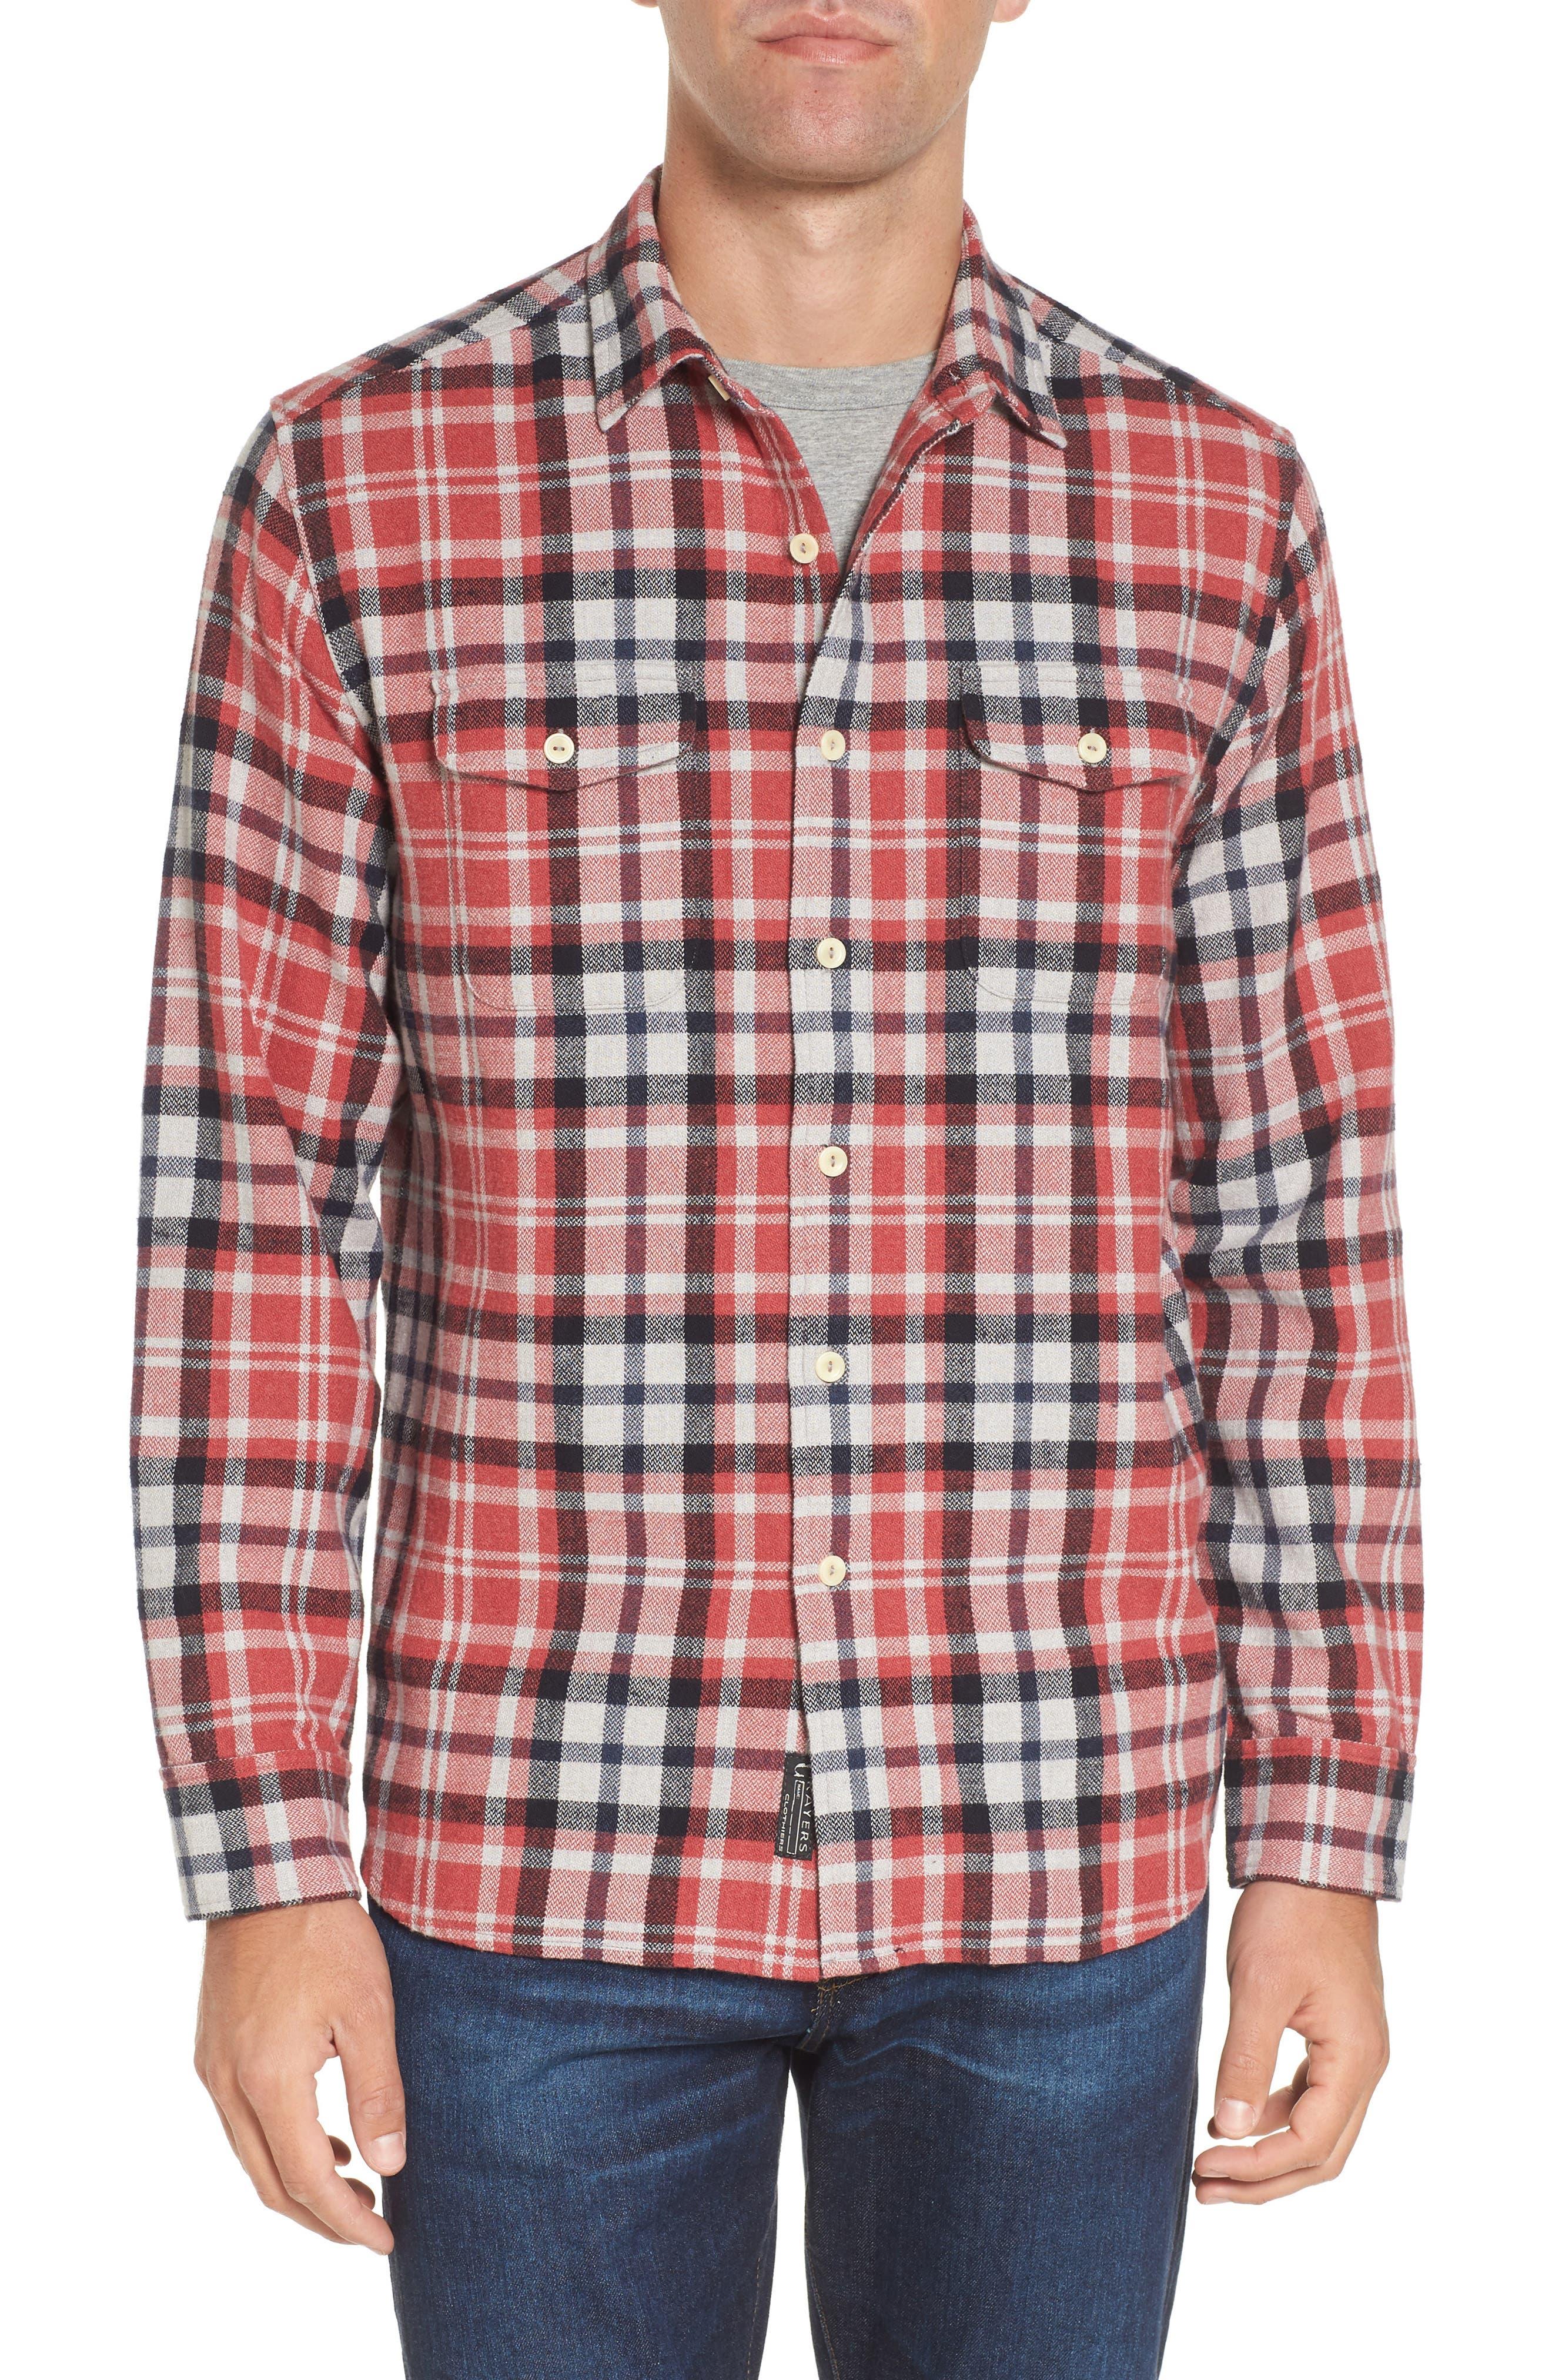 Main Image - Grayers Brampton Textured Plaid Flannel Shirt